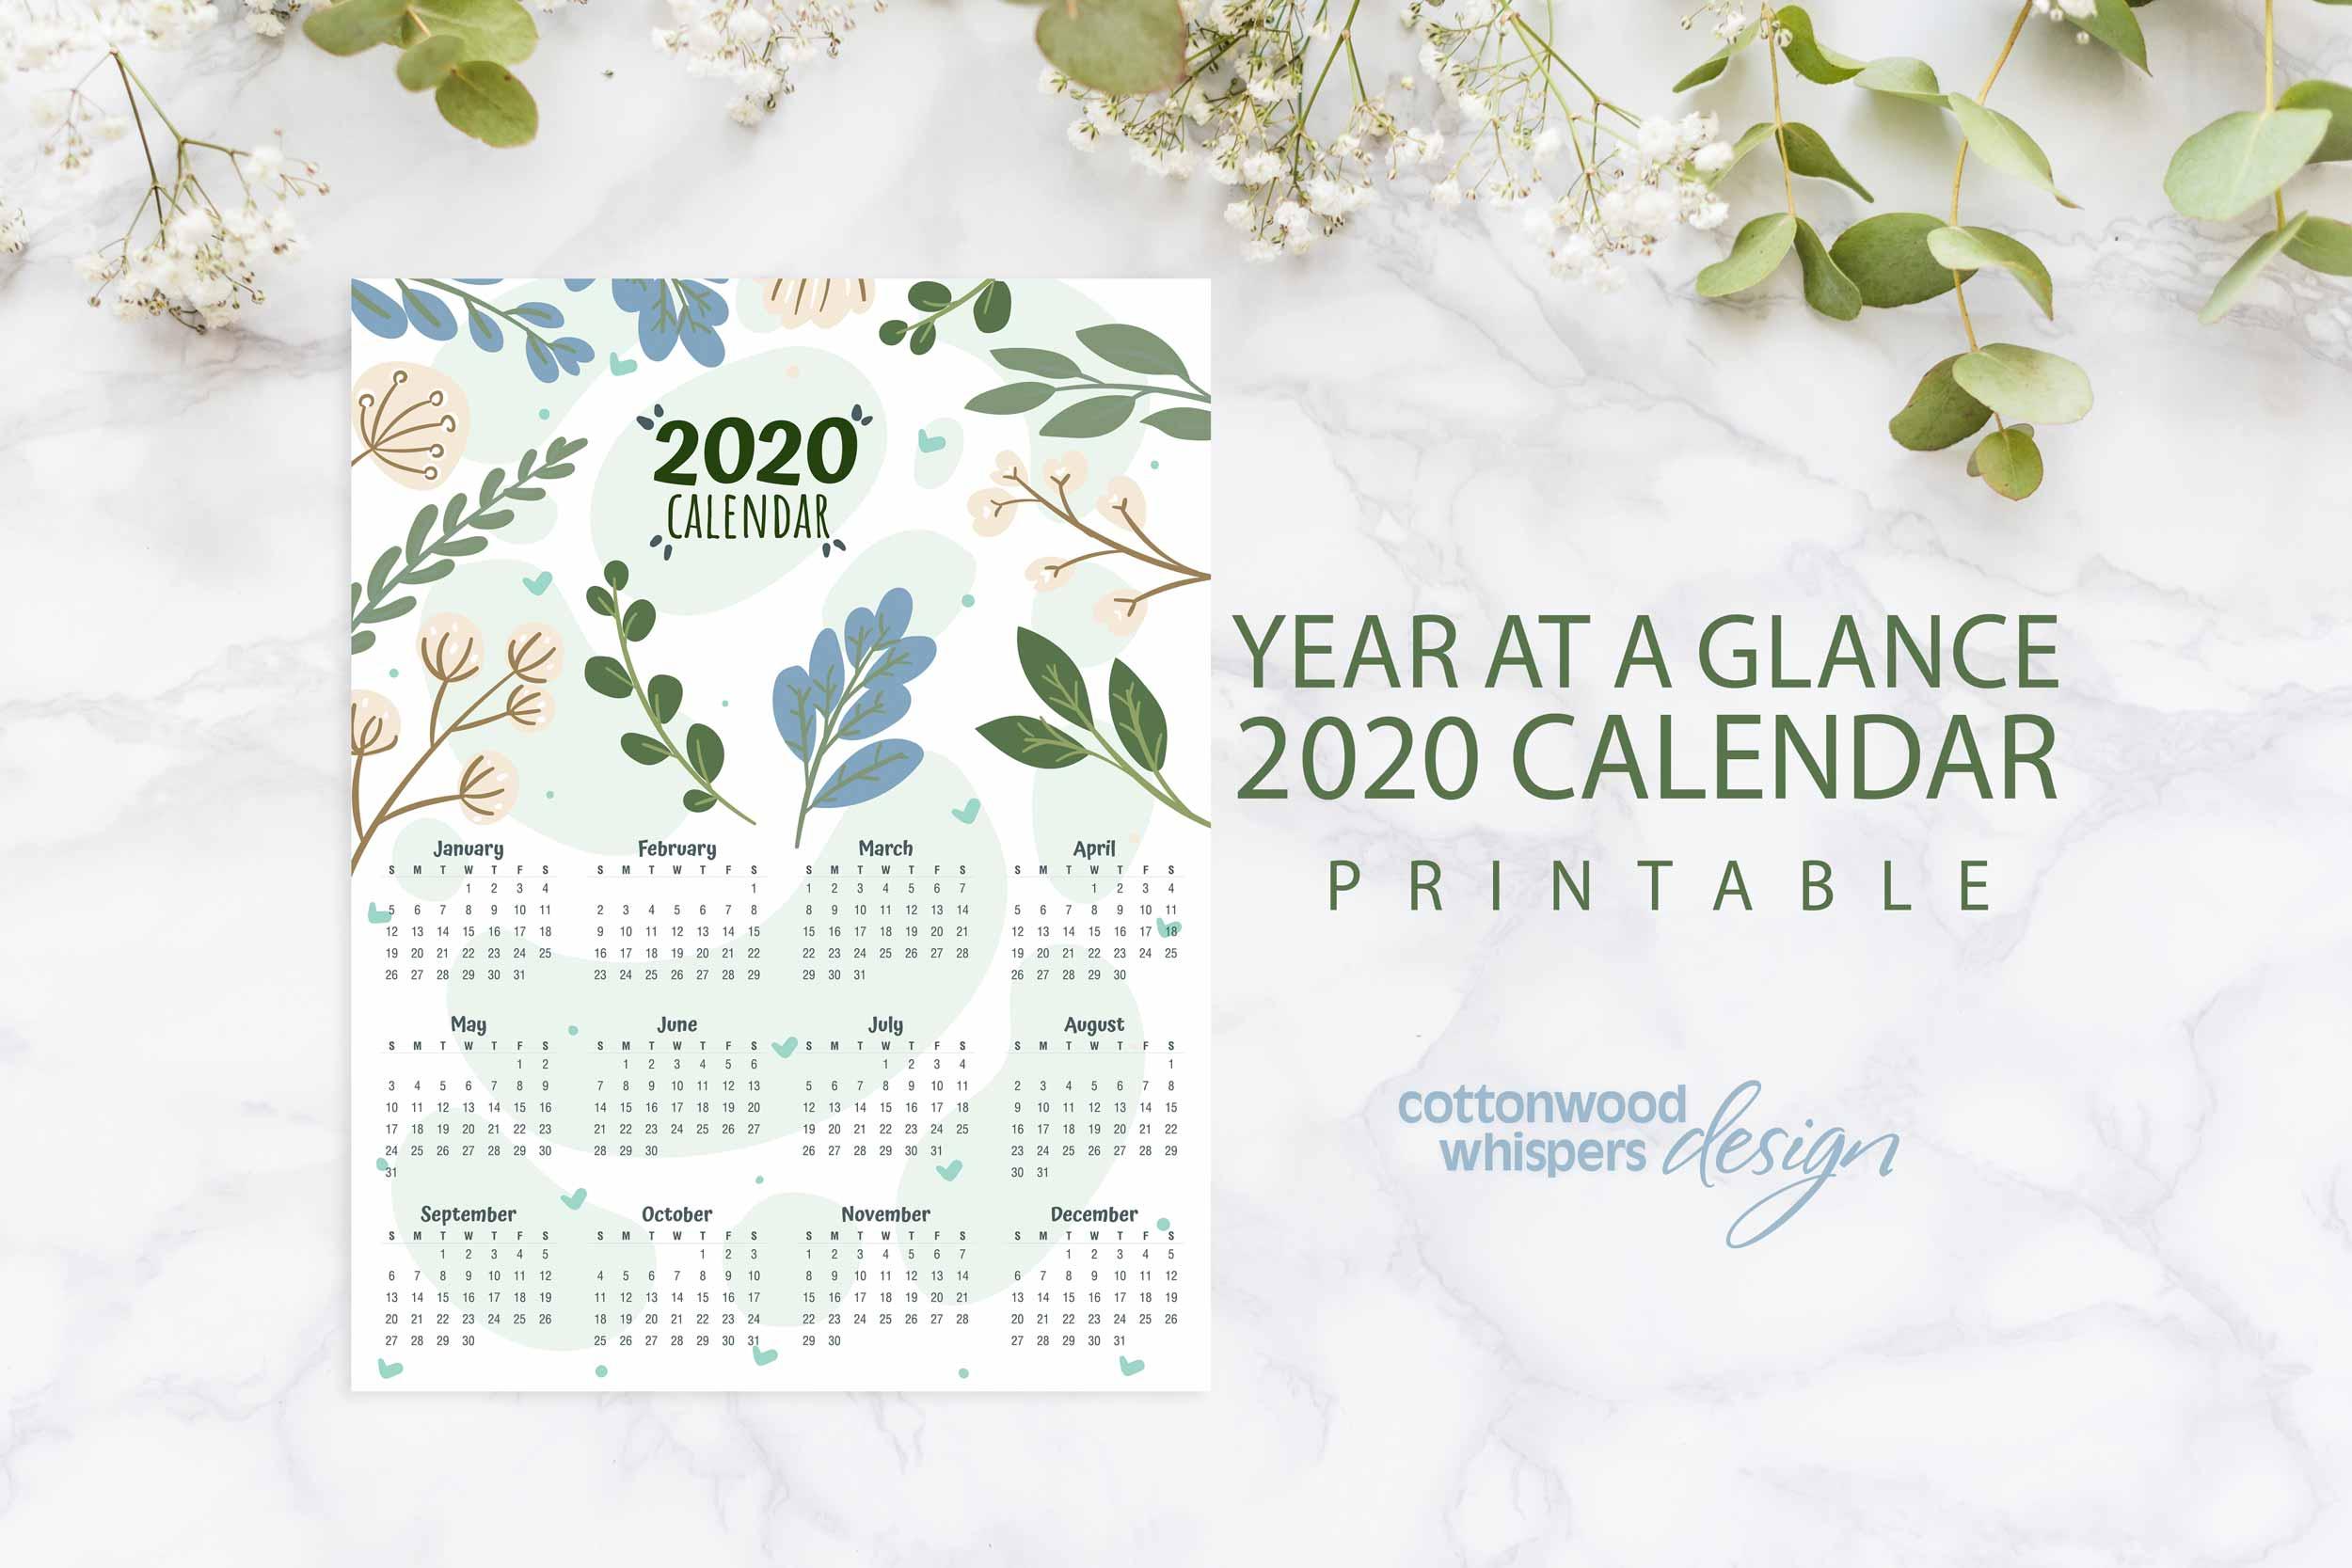 2020 Year At A Glance Calendar | Blue & Green in 2020 Calendar 8.5 X 11